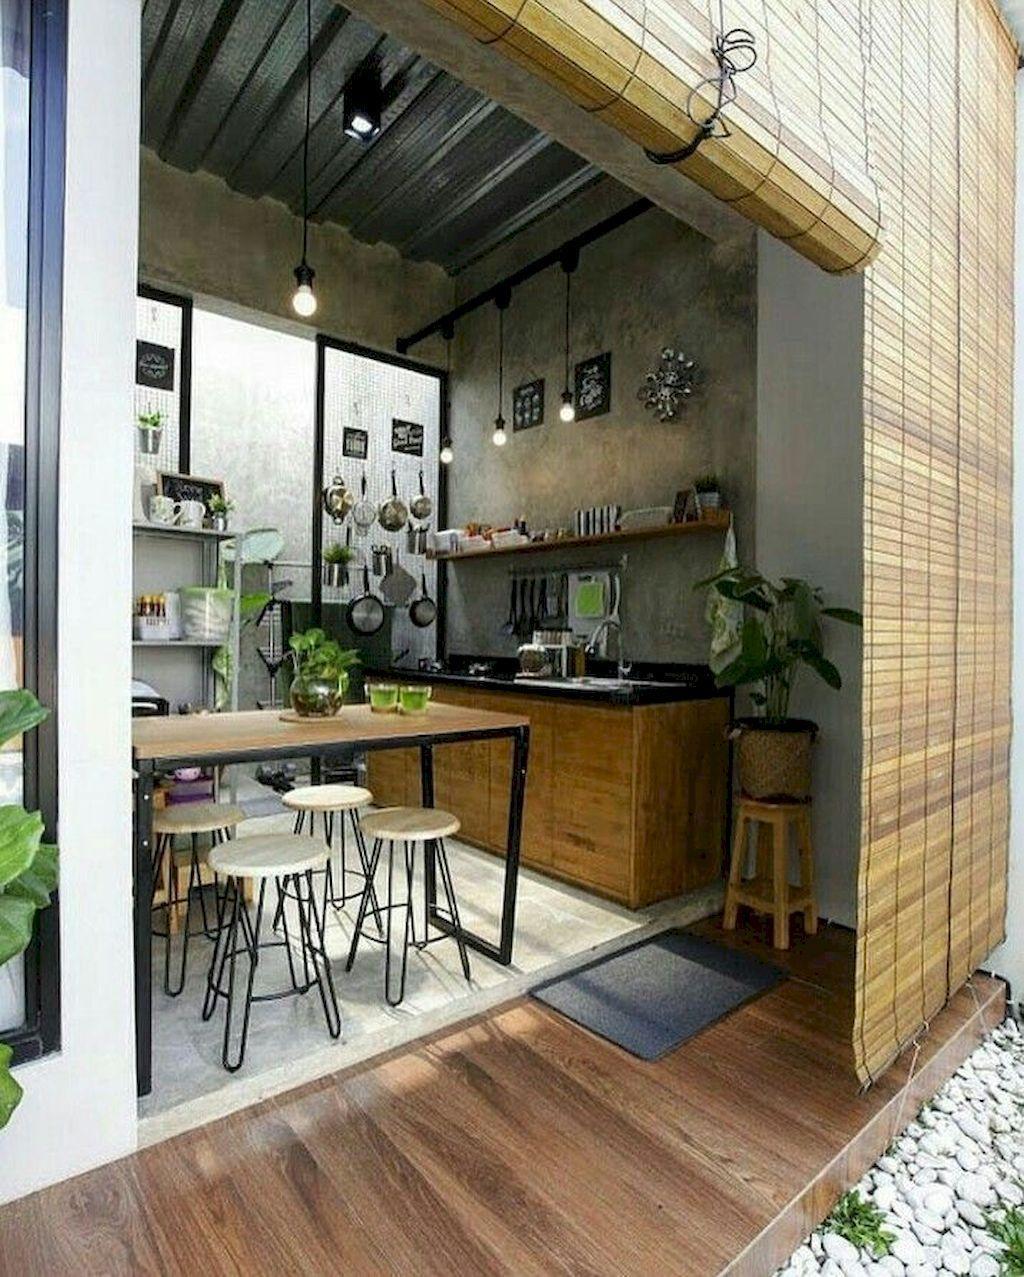 45 Modern Farmhouse Kitchen Design Ideas Kitchen Design Small Farmhouse Kitchen Design Luxury Kitchen Design